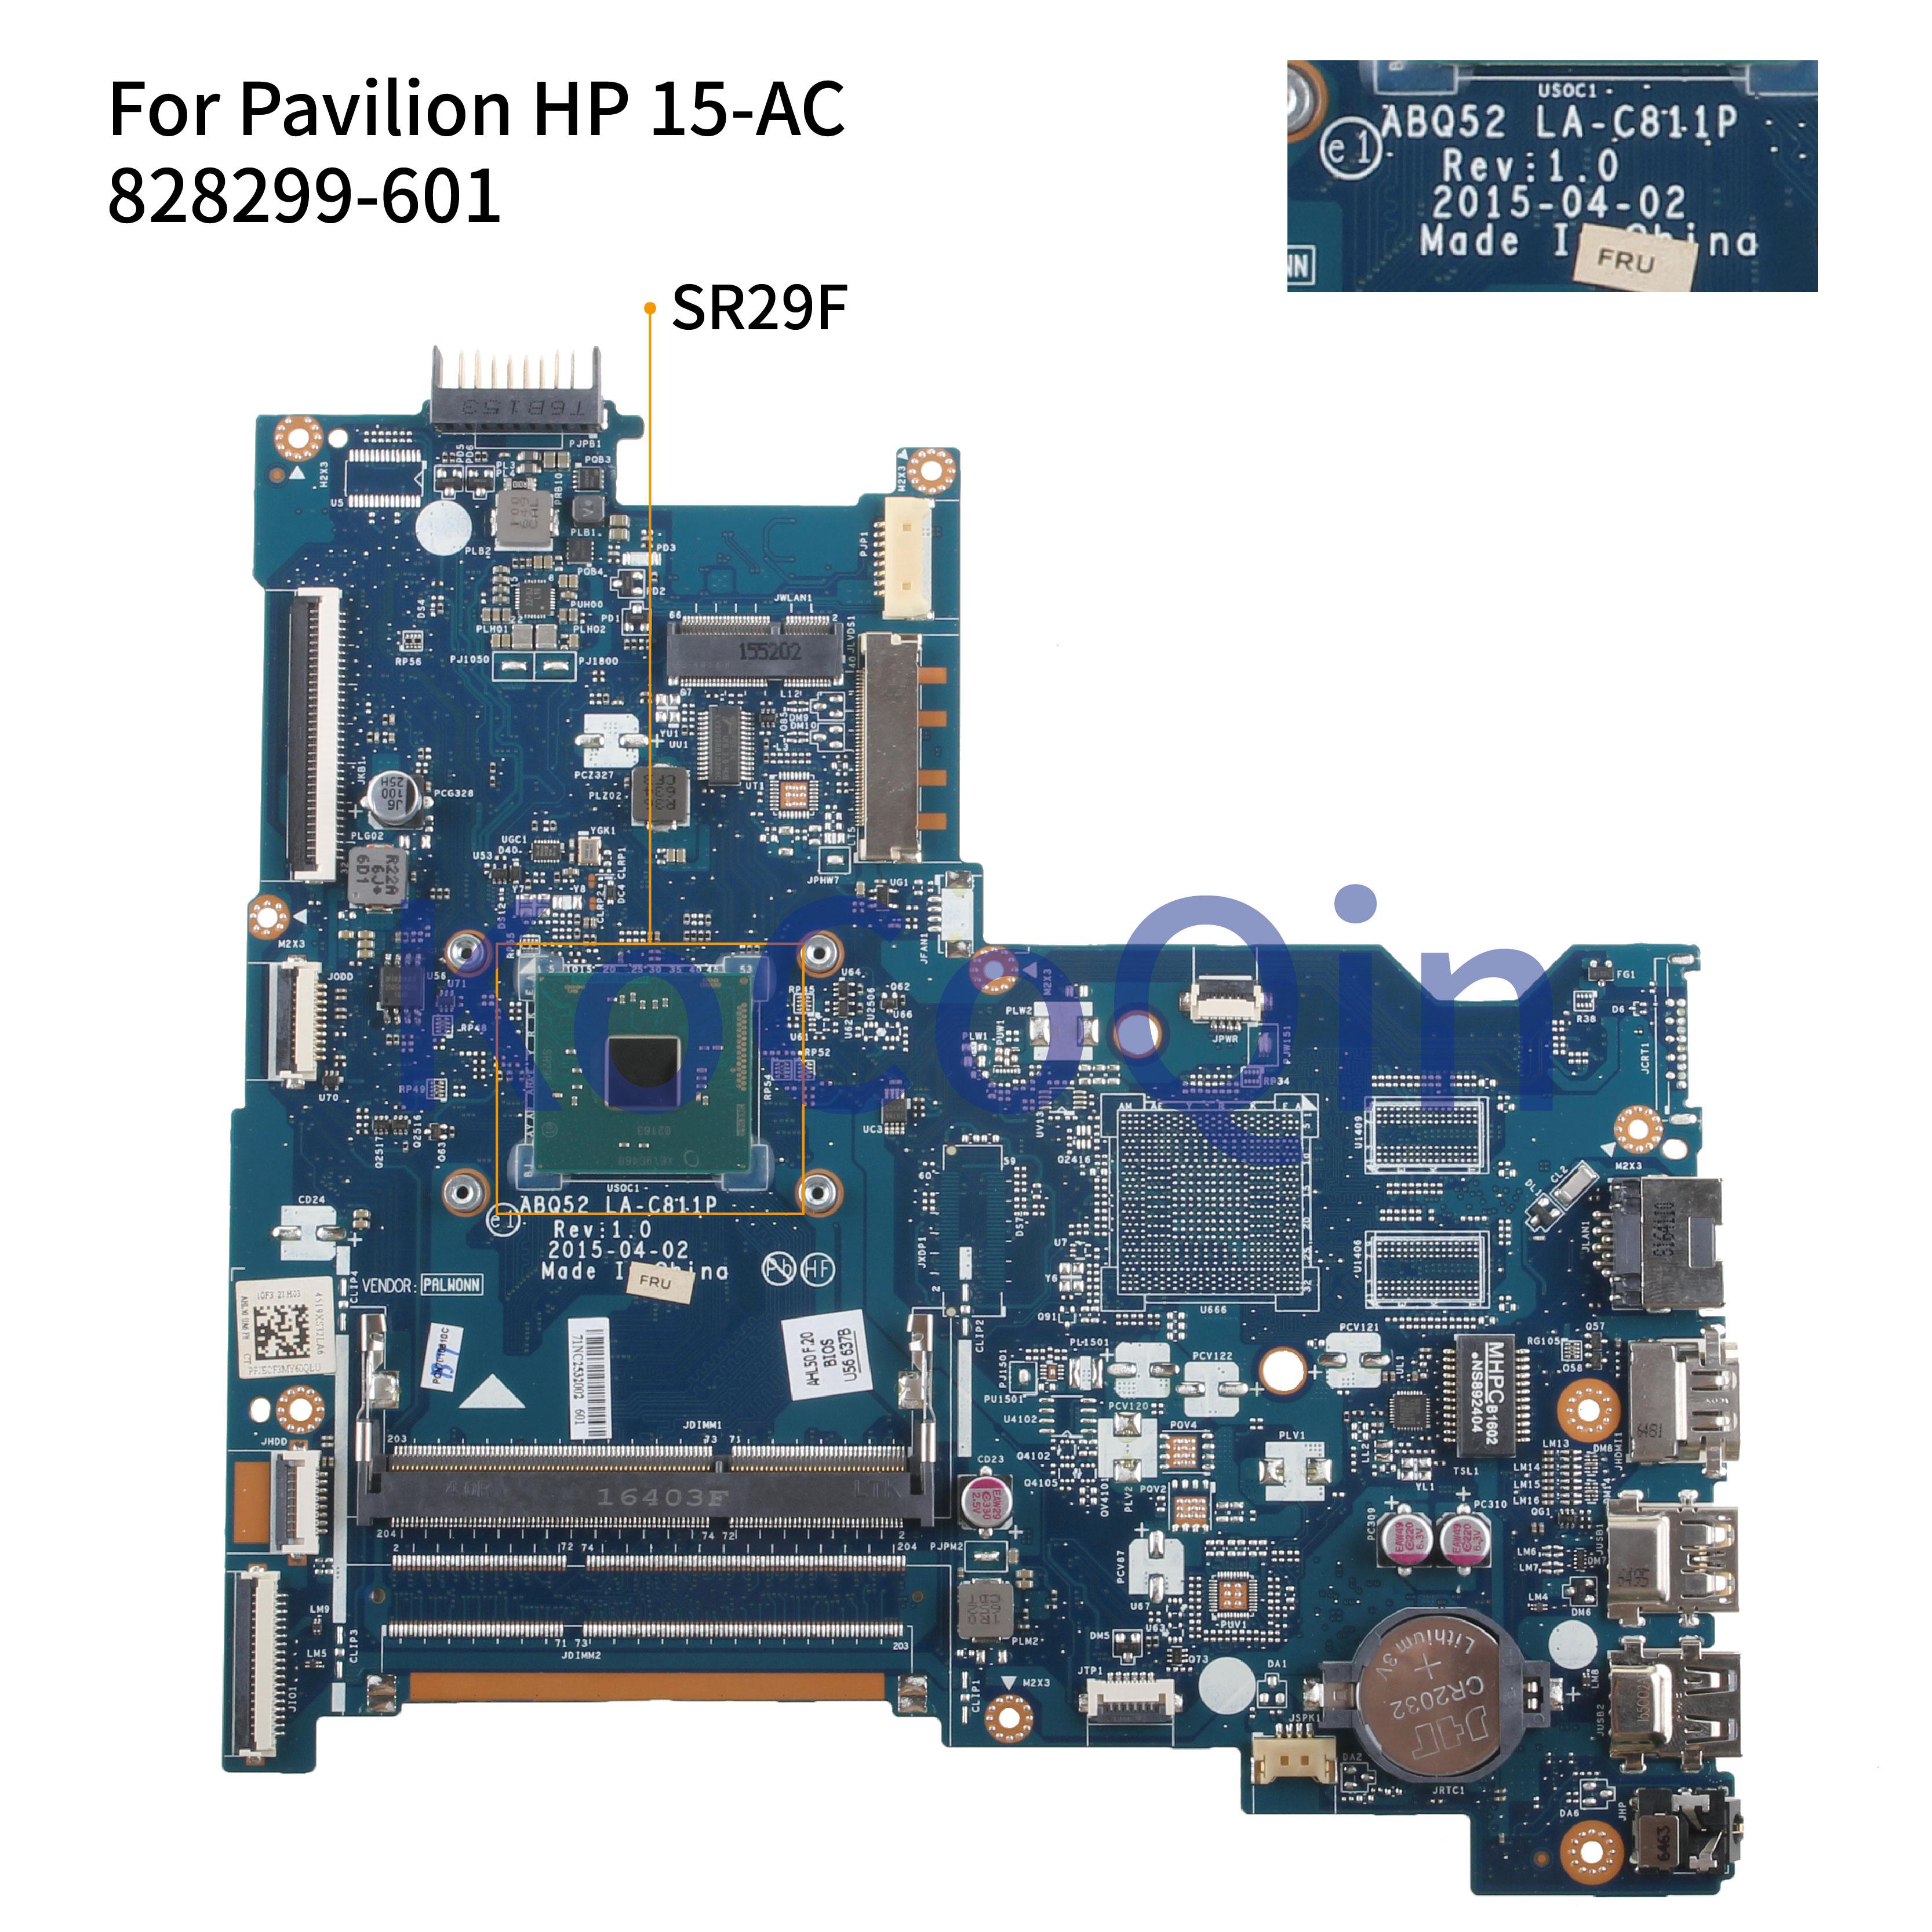 KoCoQin Laptop Motherboard For HP Pavilion 250 256 G4 15-AC Core N3150 Mainboard ABQ52 LA-C811P 828299-001 828299-601 SR29F CPU